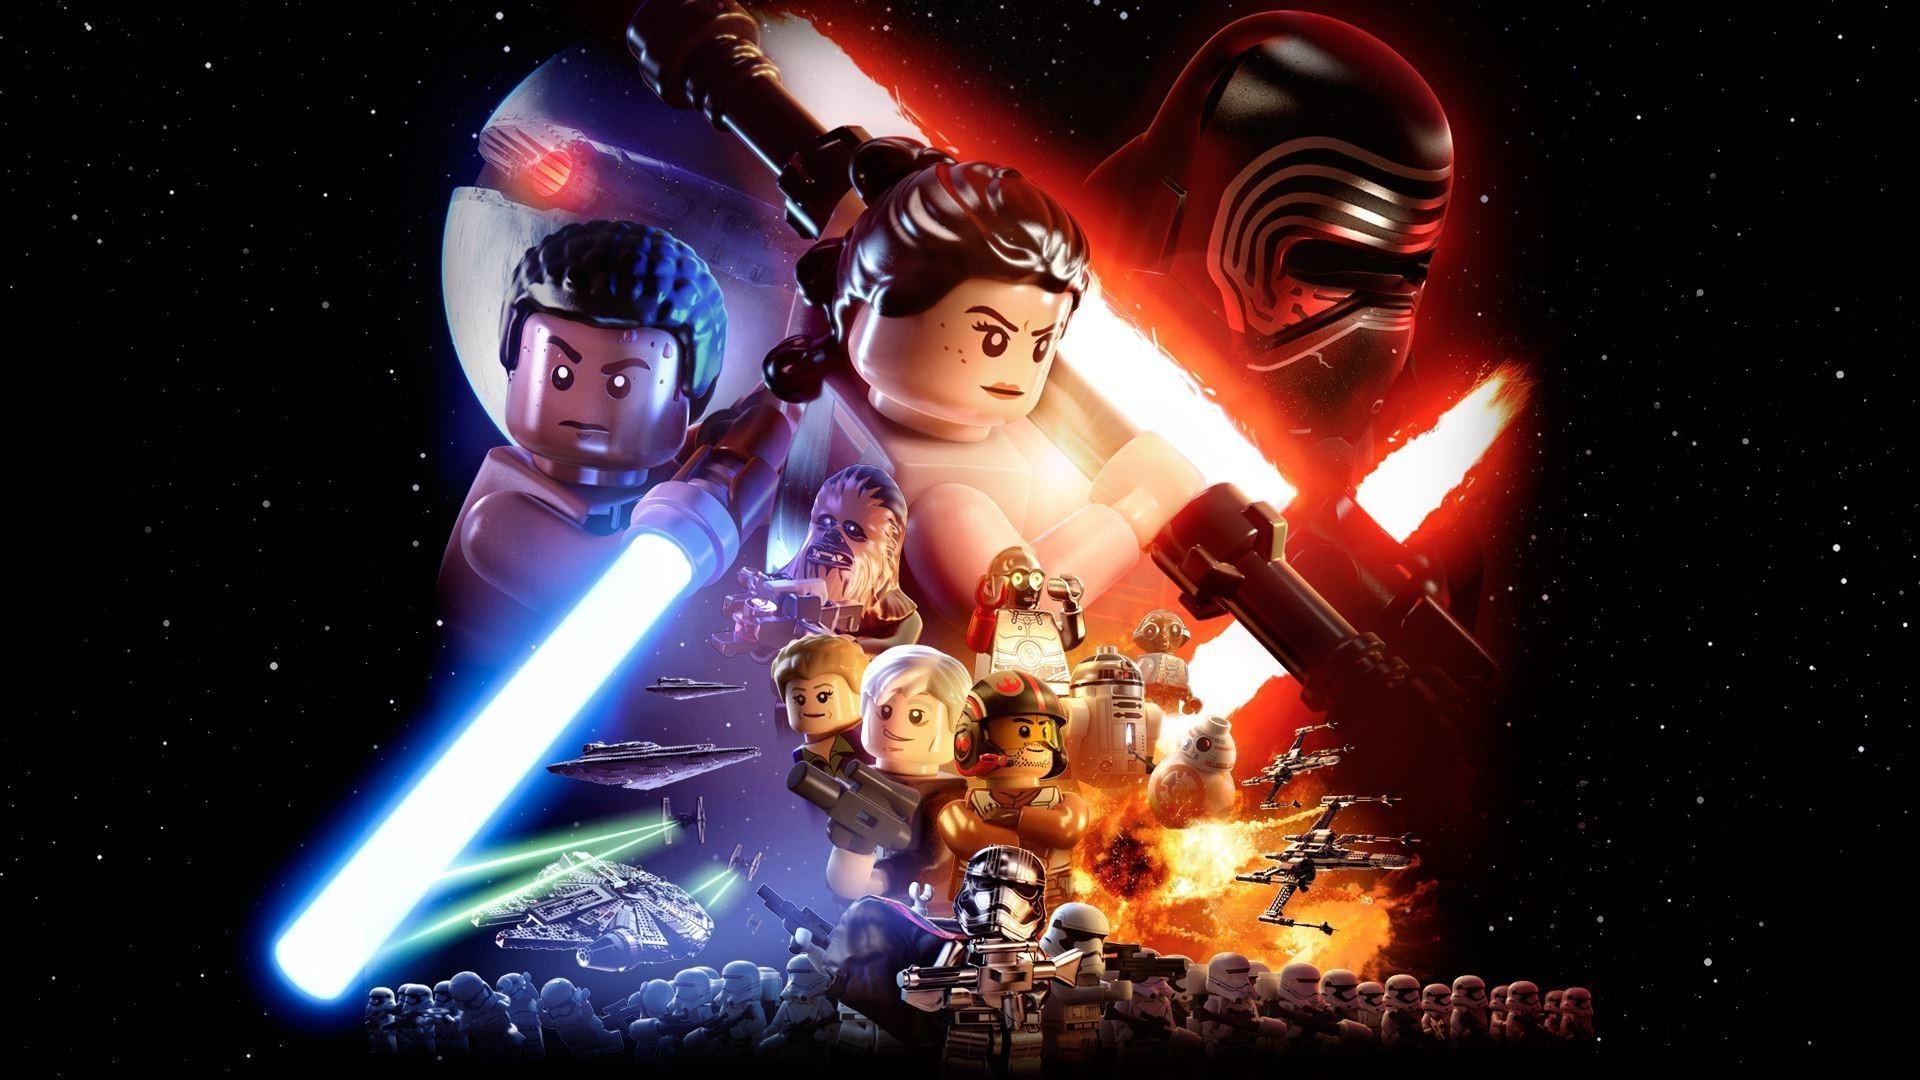 Wallpaper Illustration Star Wars Lego Star Wars The Force